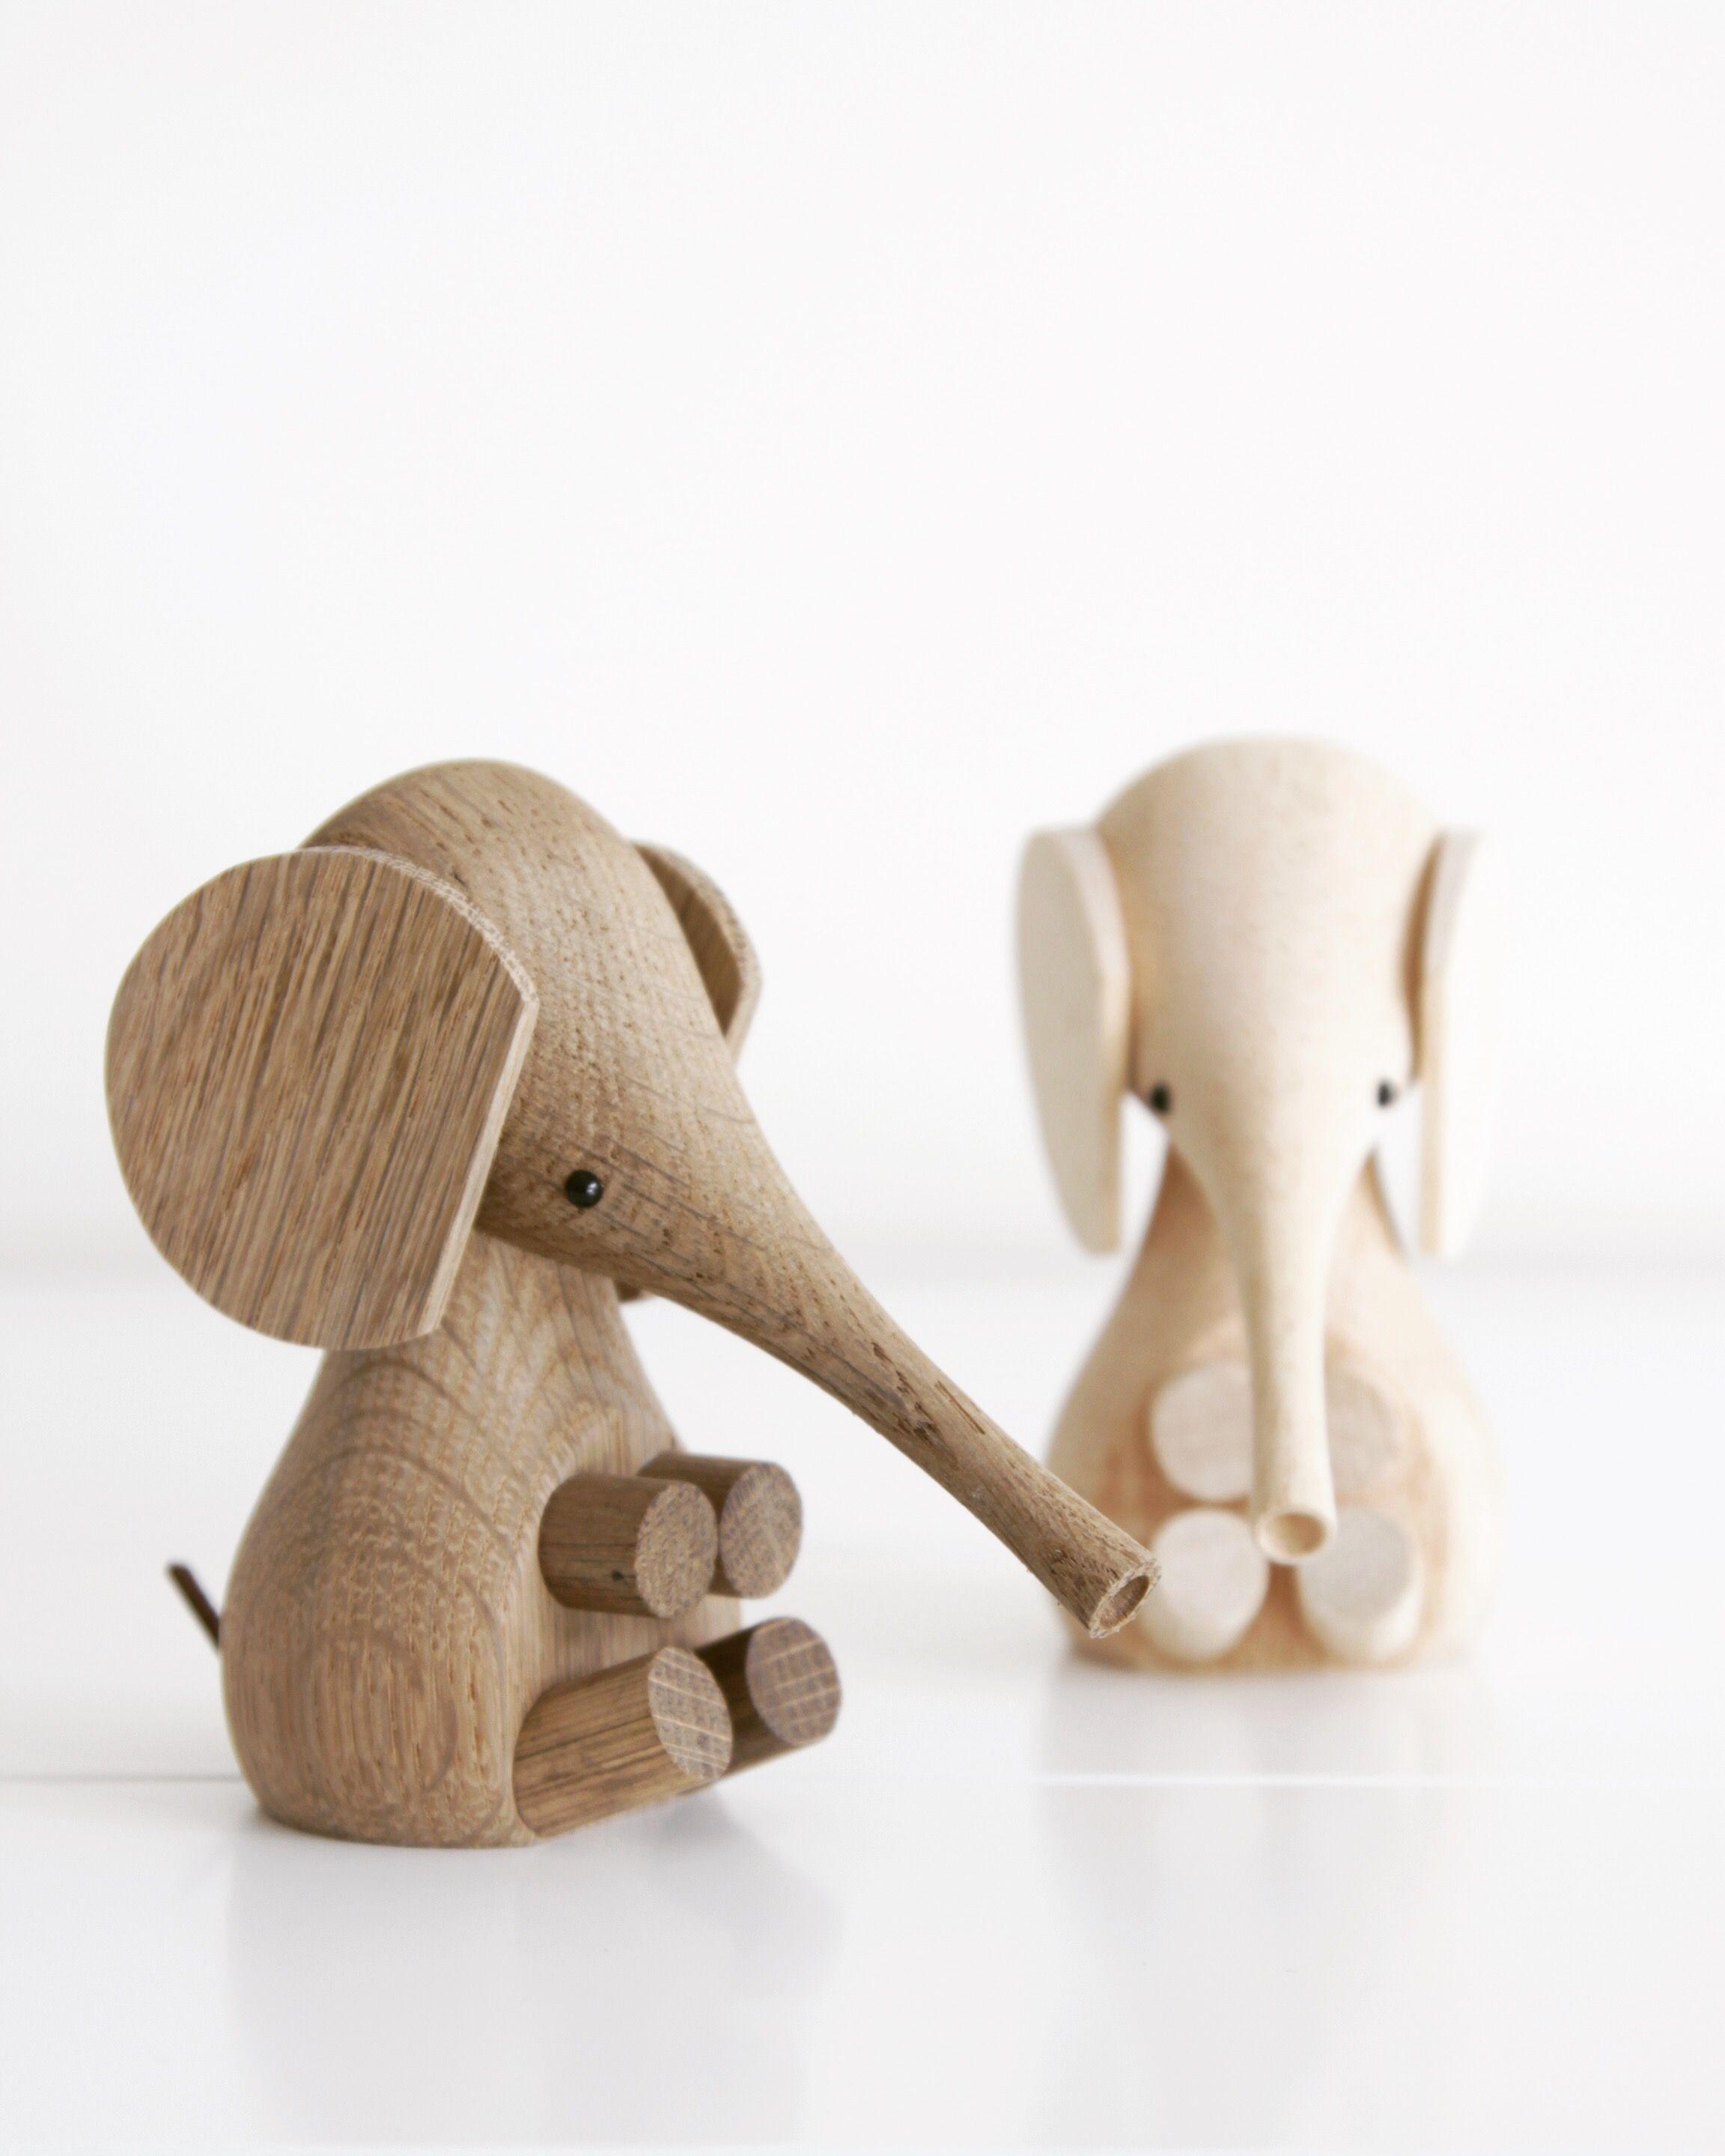 Favourite Scandinavian Nursery Kids Room Decor Items: Our Favourite Little Baby Elephants By Lucie Kaas